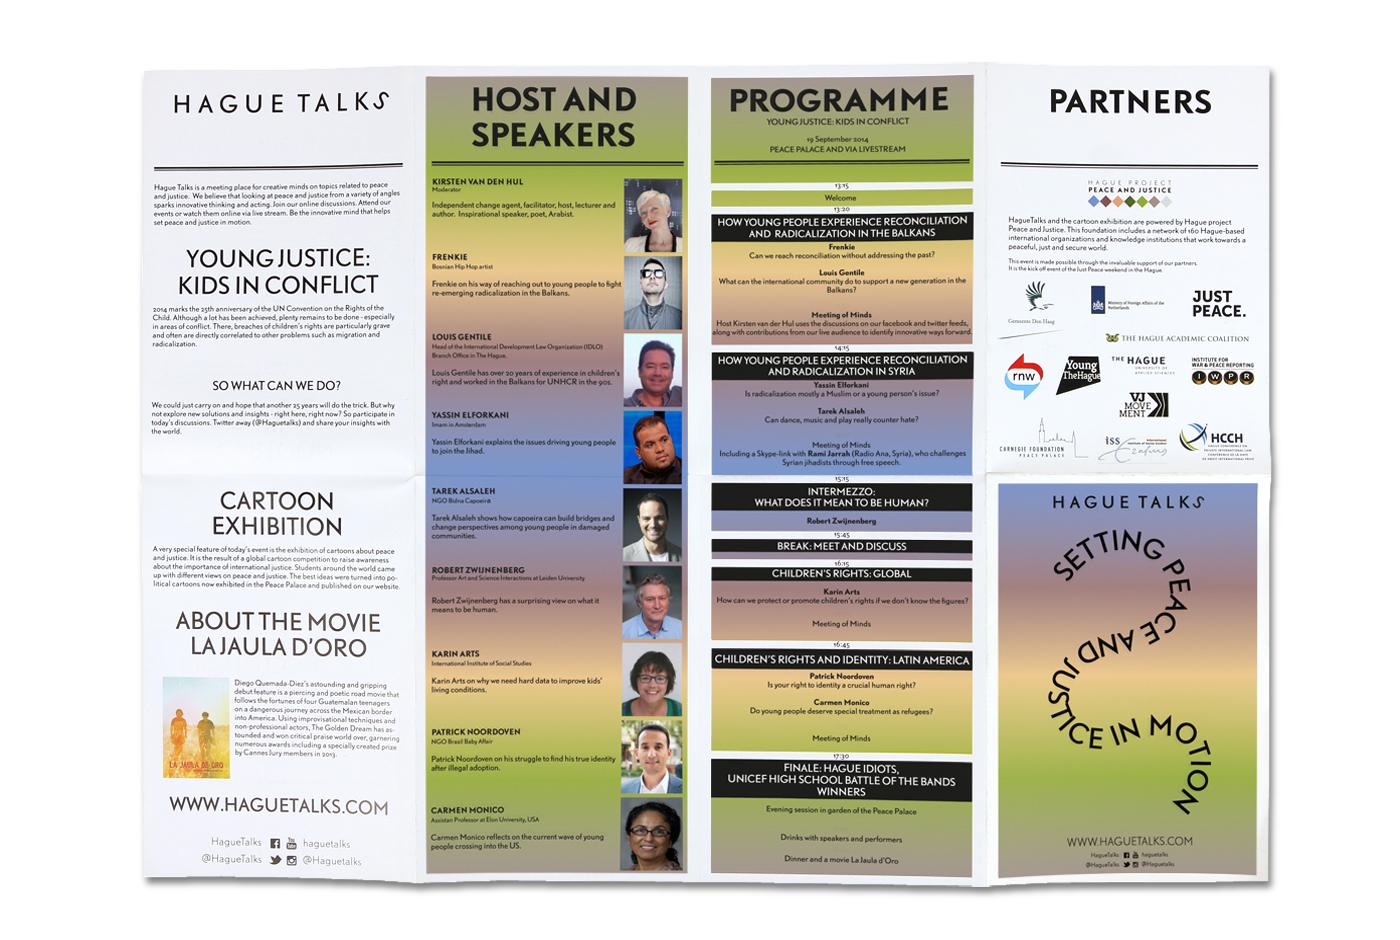 Hague Talks Identity